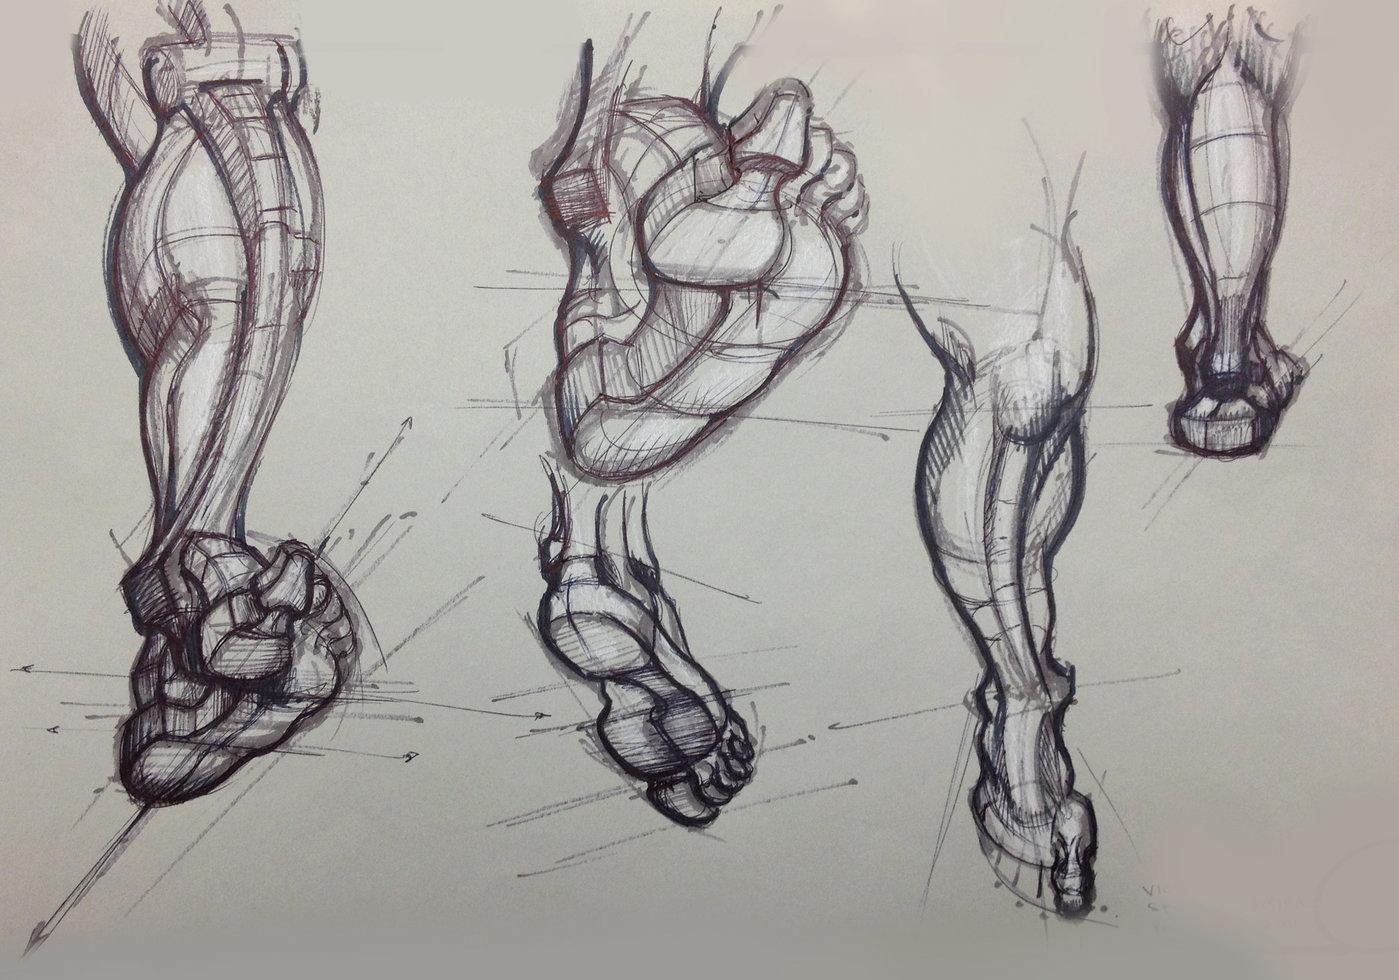 Sketchbook Figure By Victoria Spriggs At Coroflot